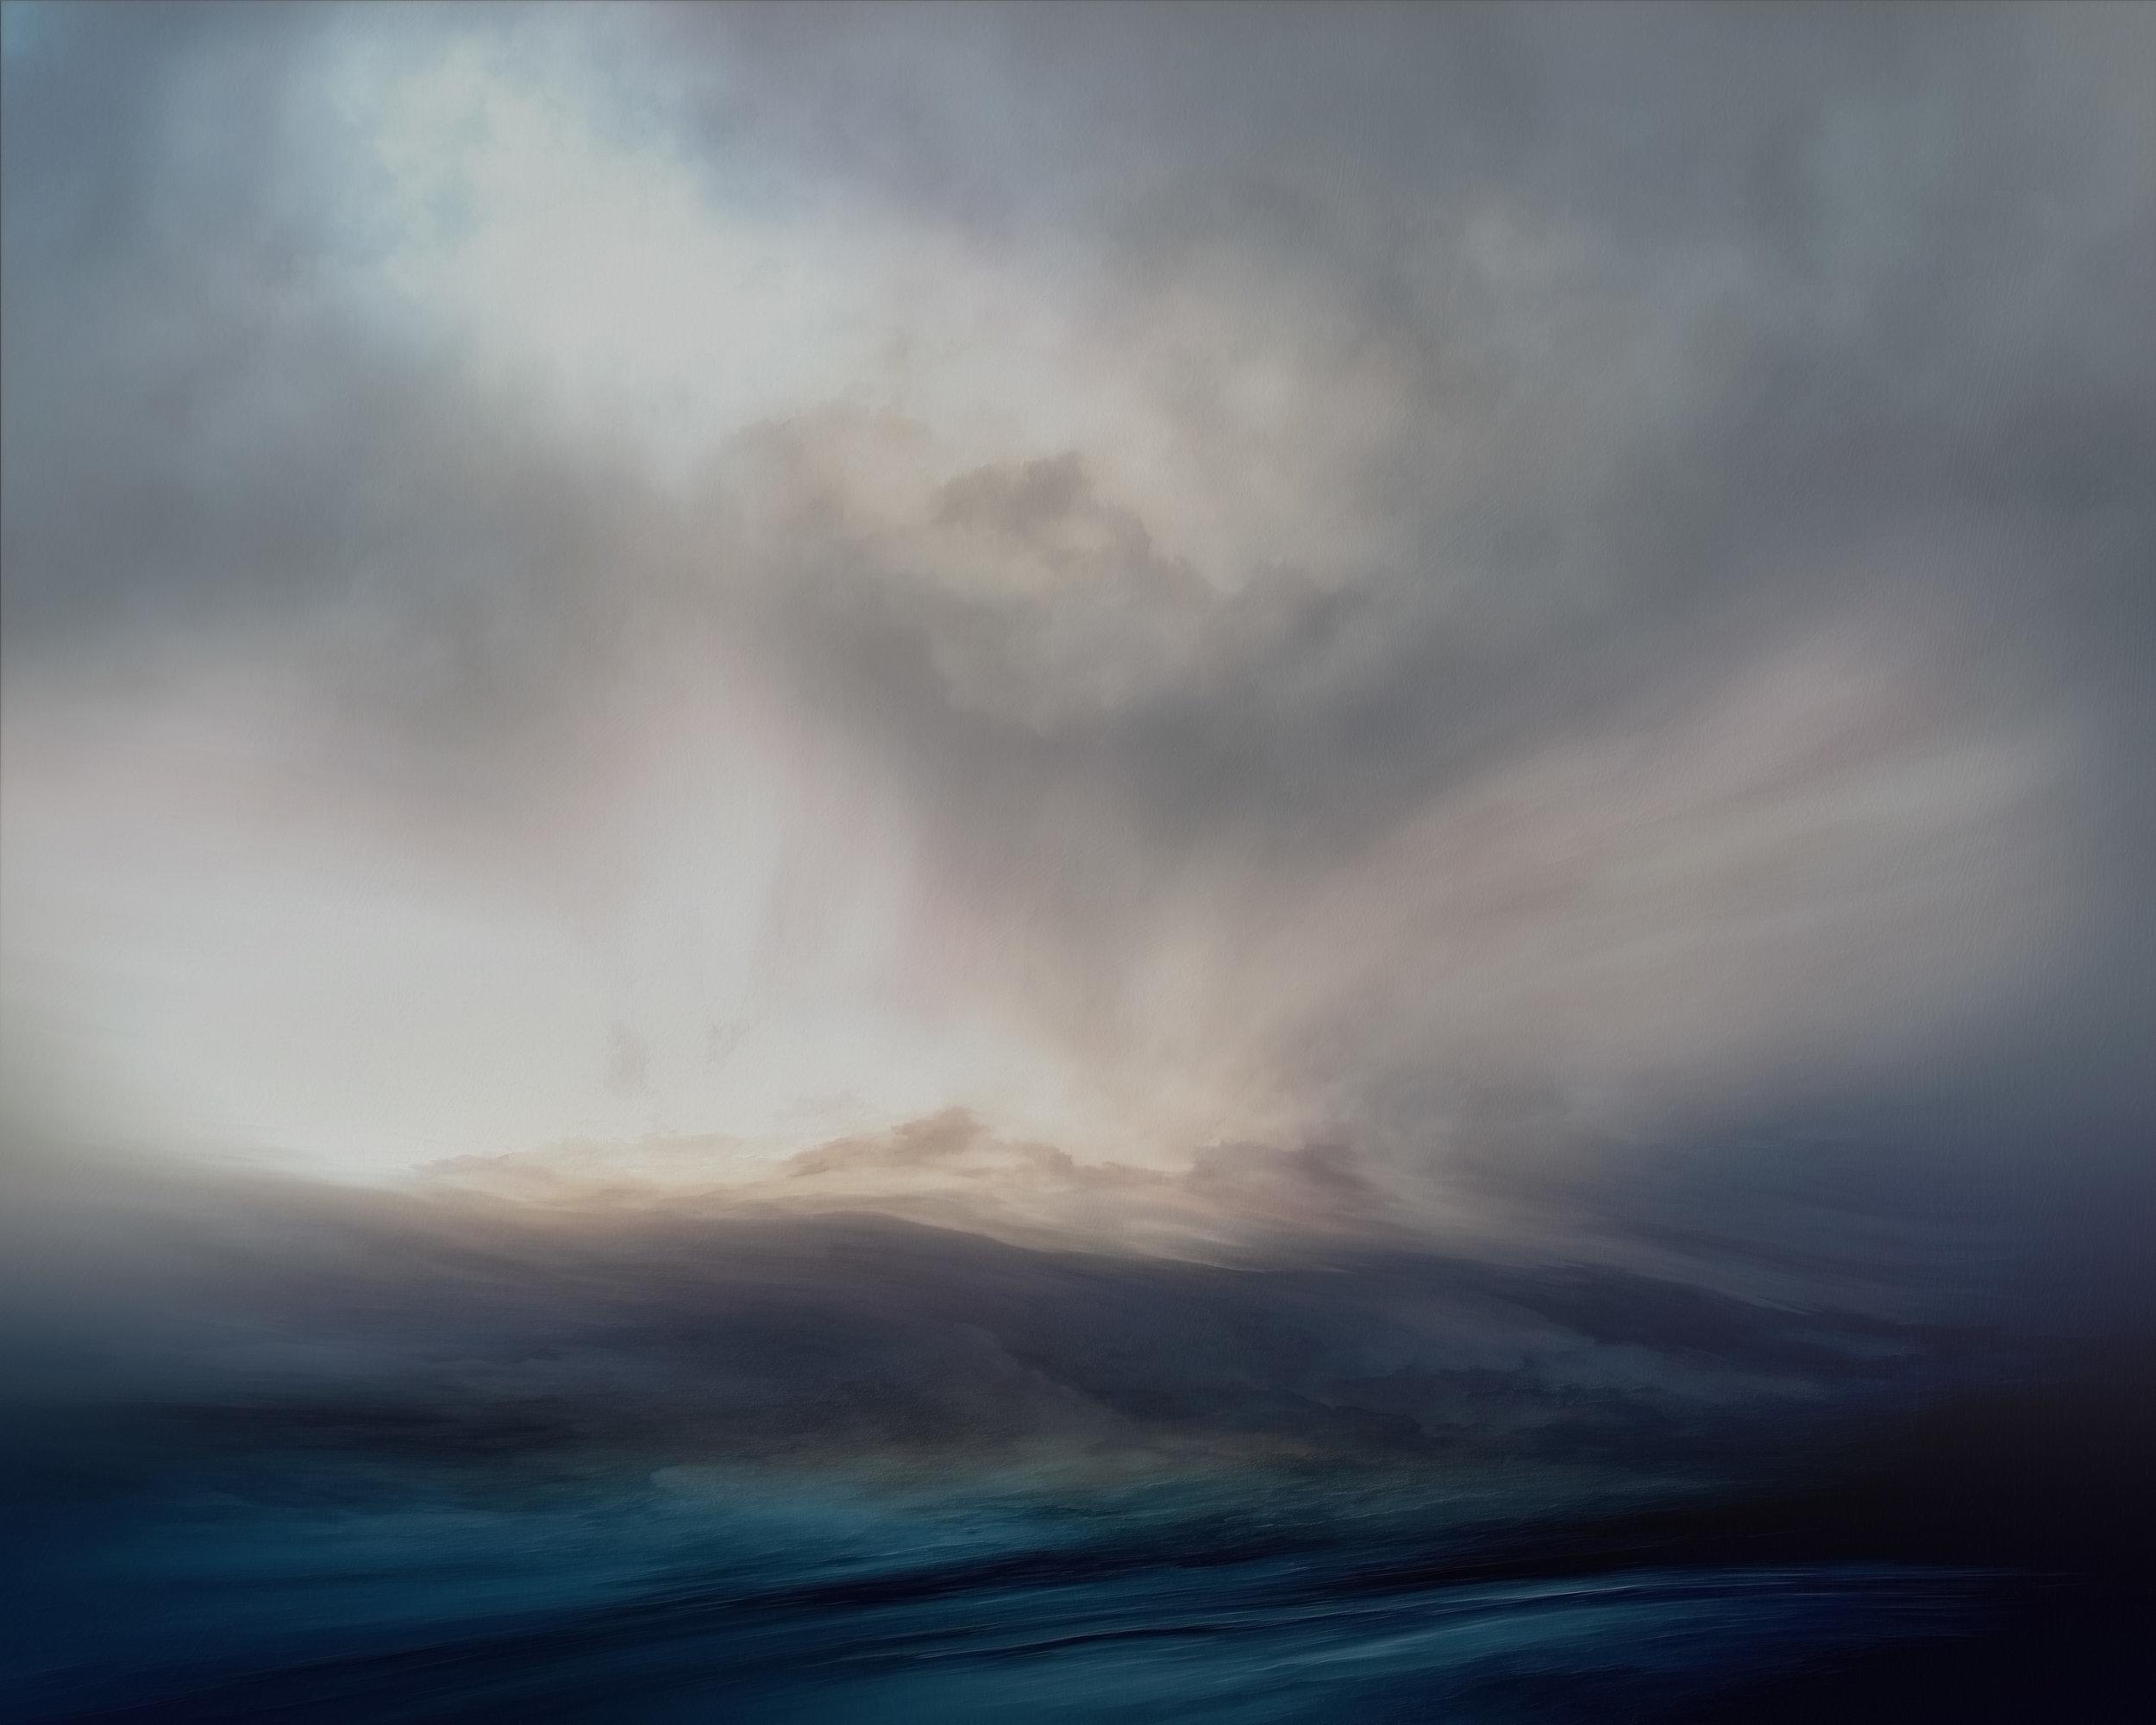 Navy Blue Sea